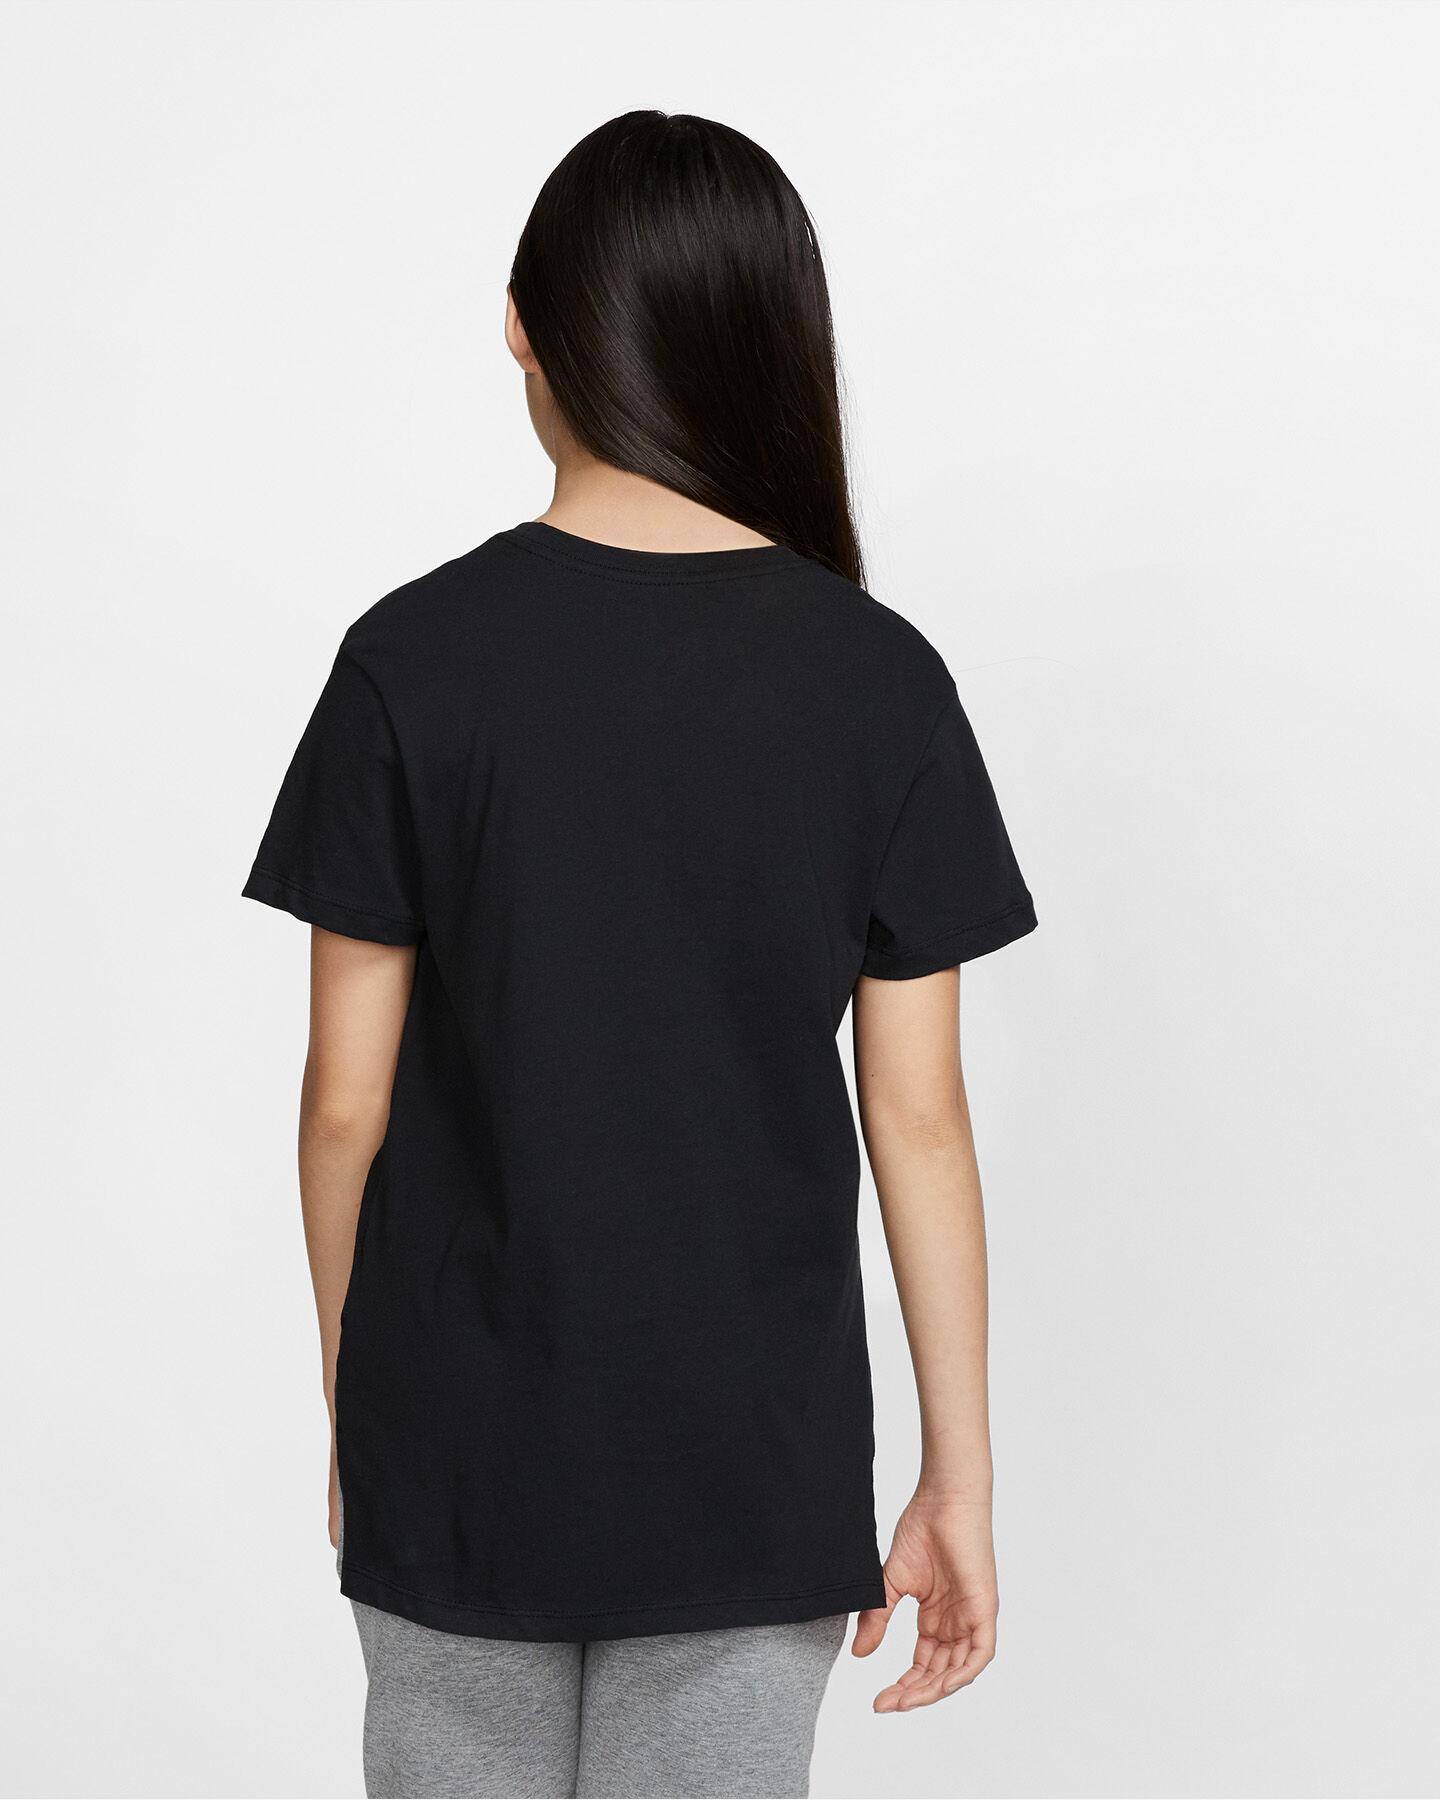 T-Shirt NIKE SWOOSH JR S2023505 scatto 3